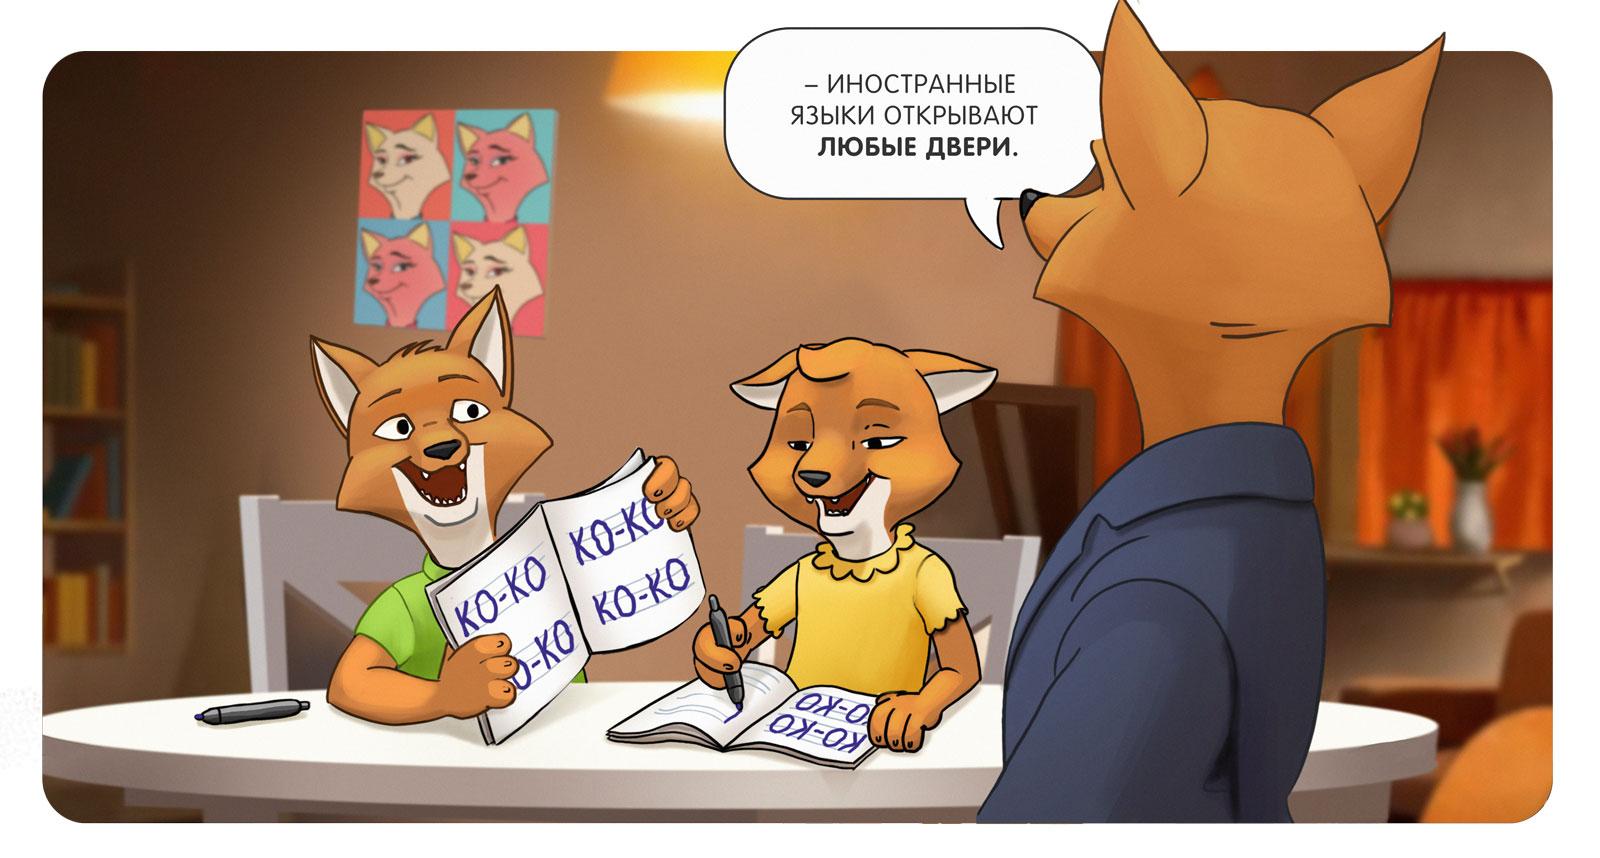 9_september_Troekurovo_smartians